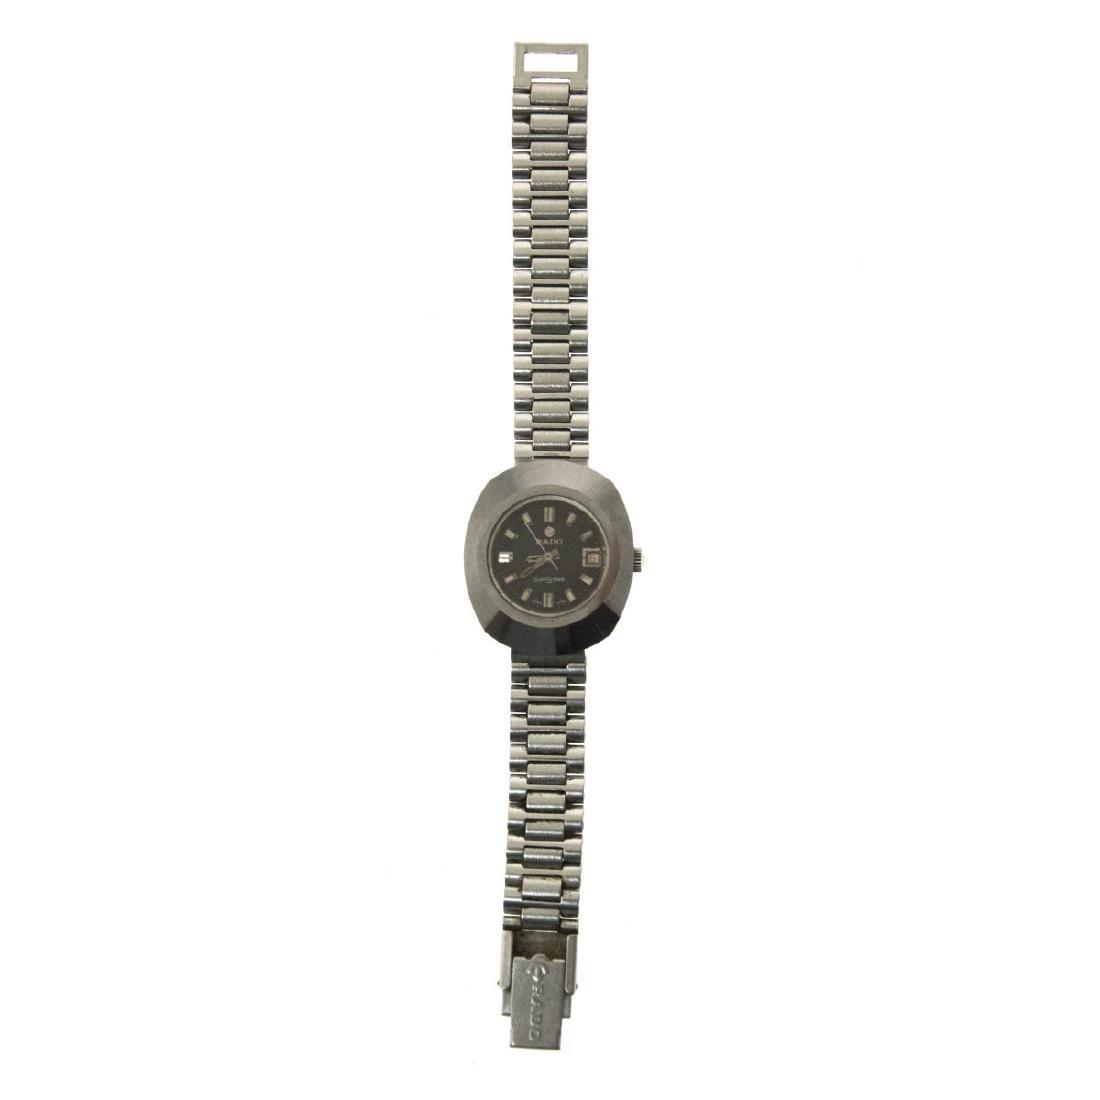 Rado Diastar Ladies Wrist Watch.